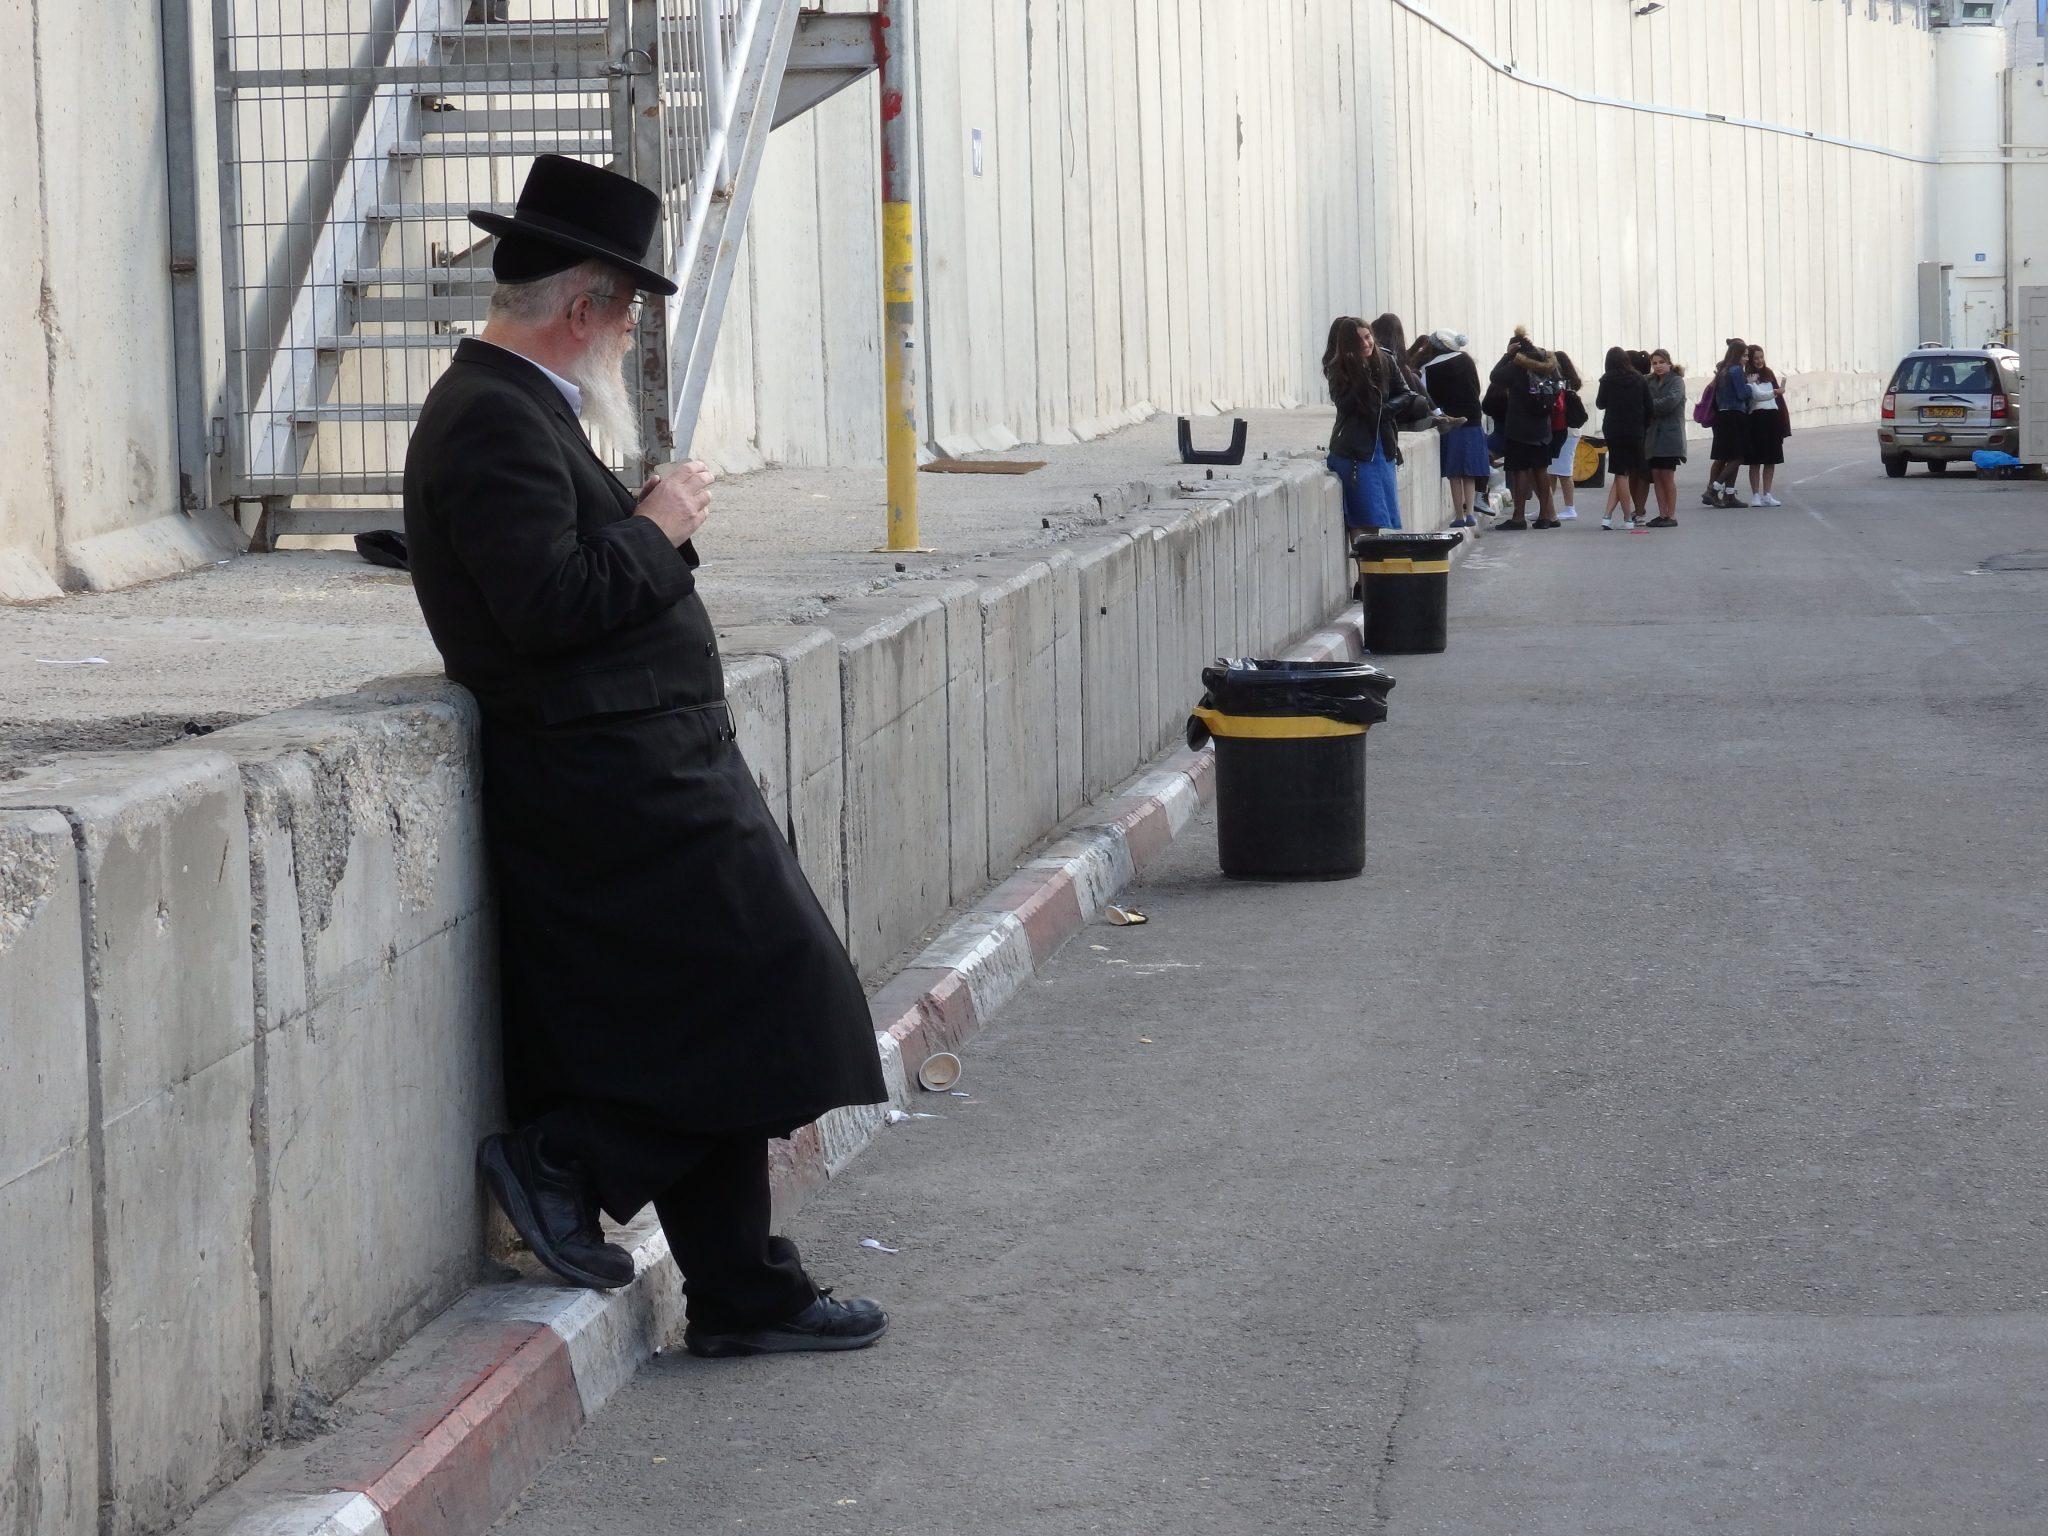 An Orthodox Jew takes a break outside Rachels Tomb